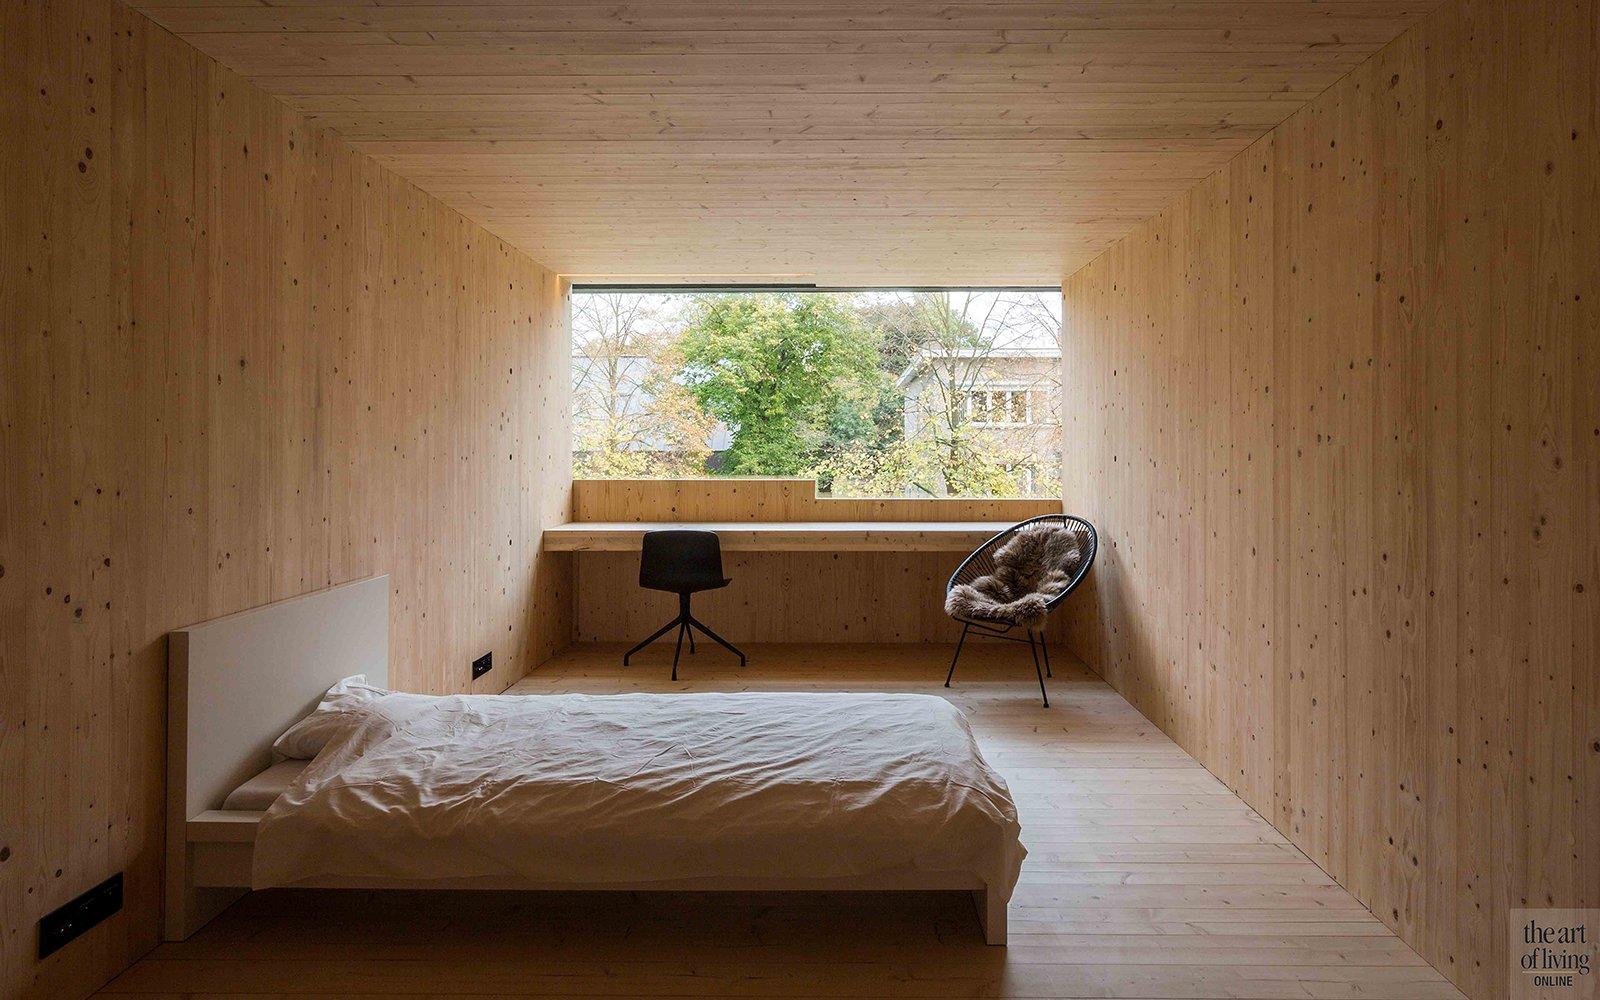 bureau, bed, slaapkamer, raam, hout